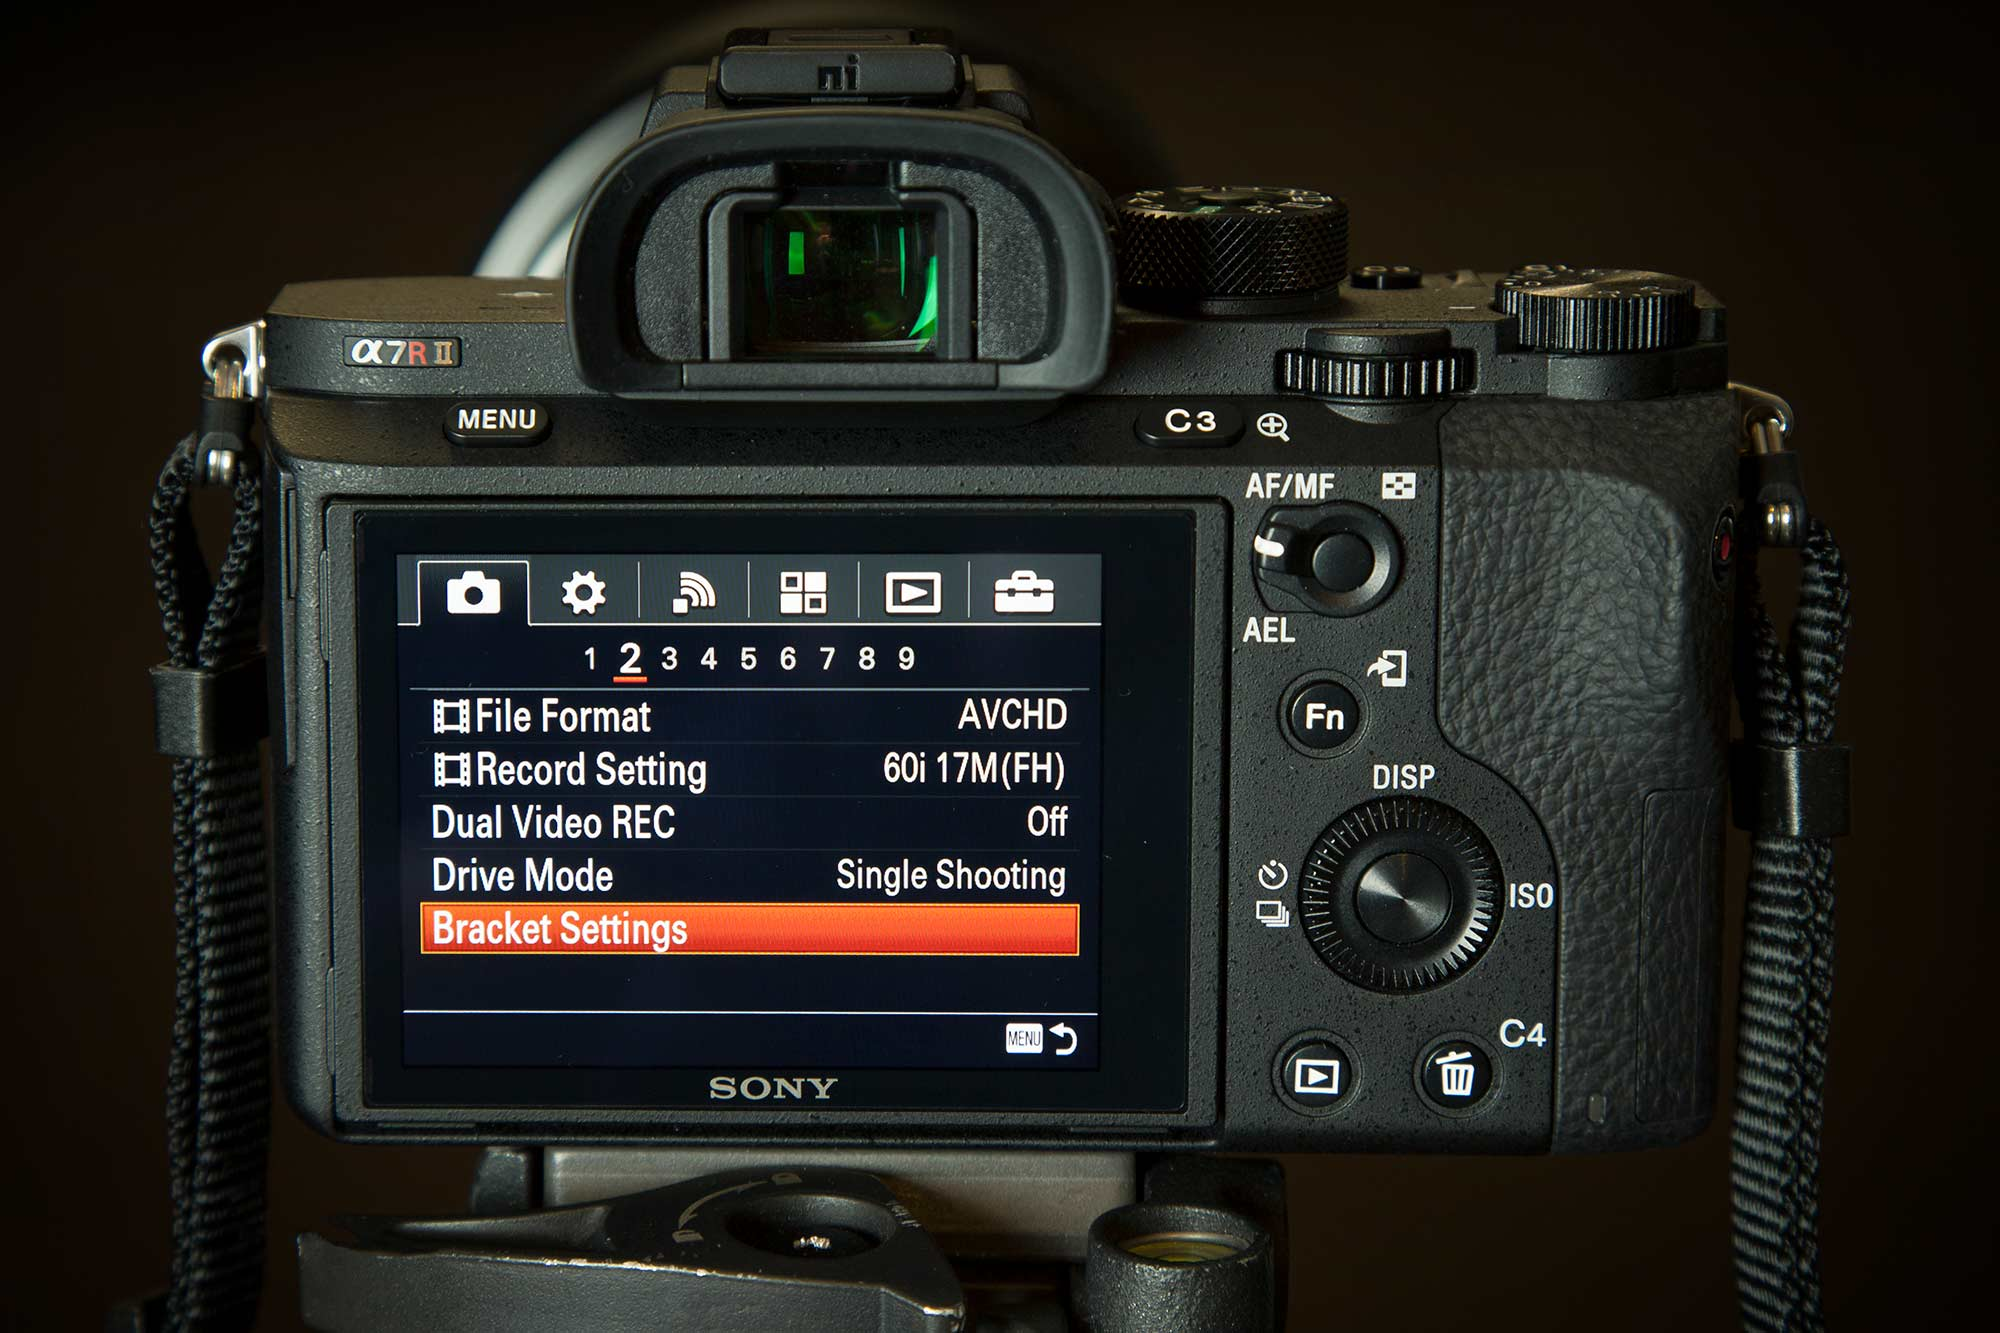 No Wireless Remote Set Timer for Image Bracketing